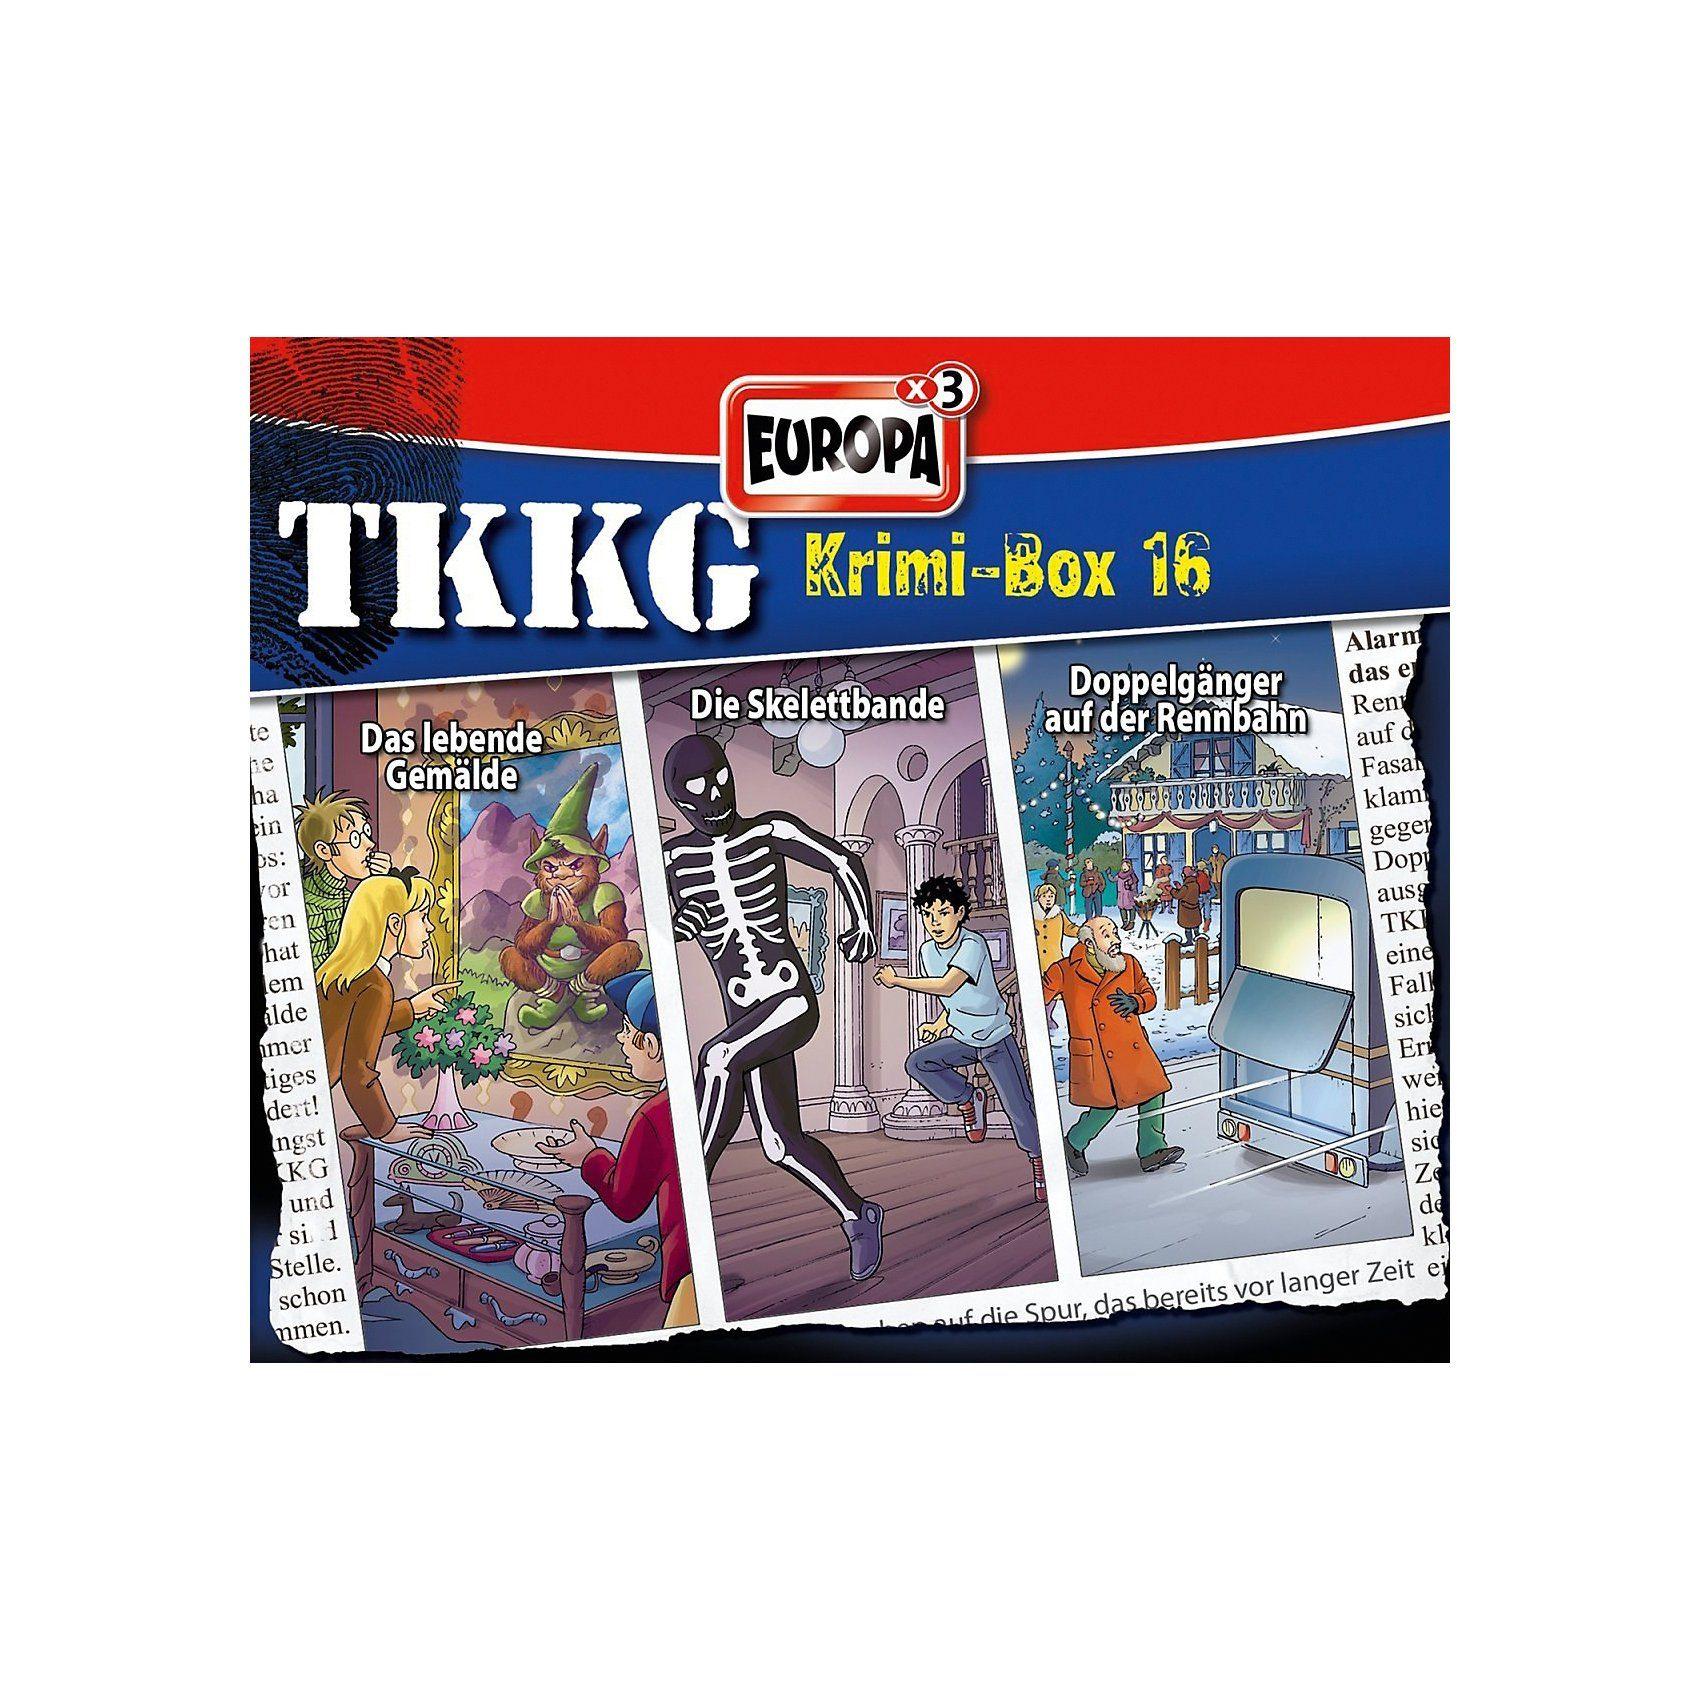 Sony CD TKKG - Krimibox 16 (Folgen 171, 173, 174)